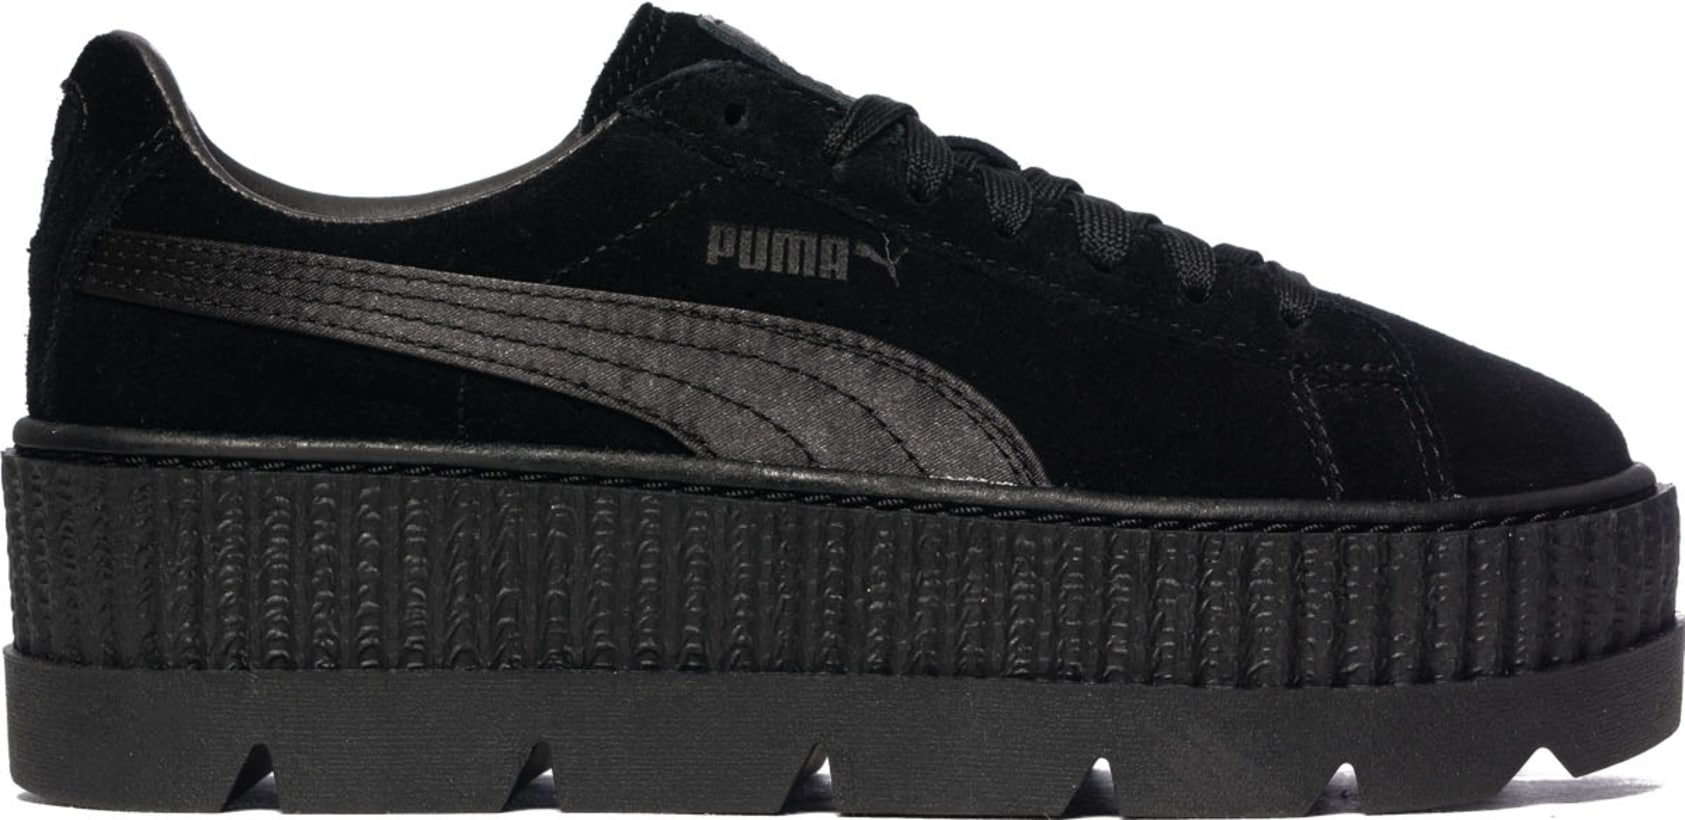 the best attitude df2eb 8b295 Puma - Fenty Cleated Creeper - Puma Black